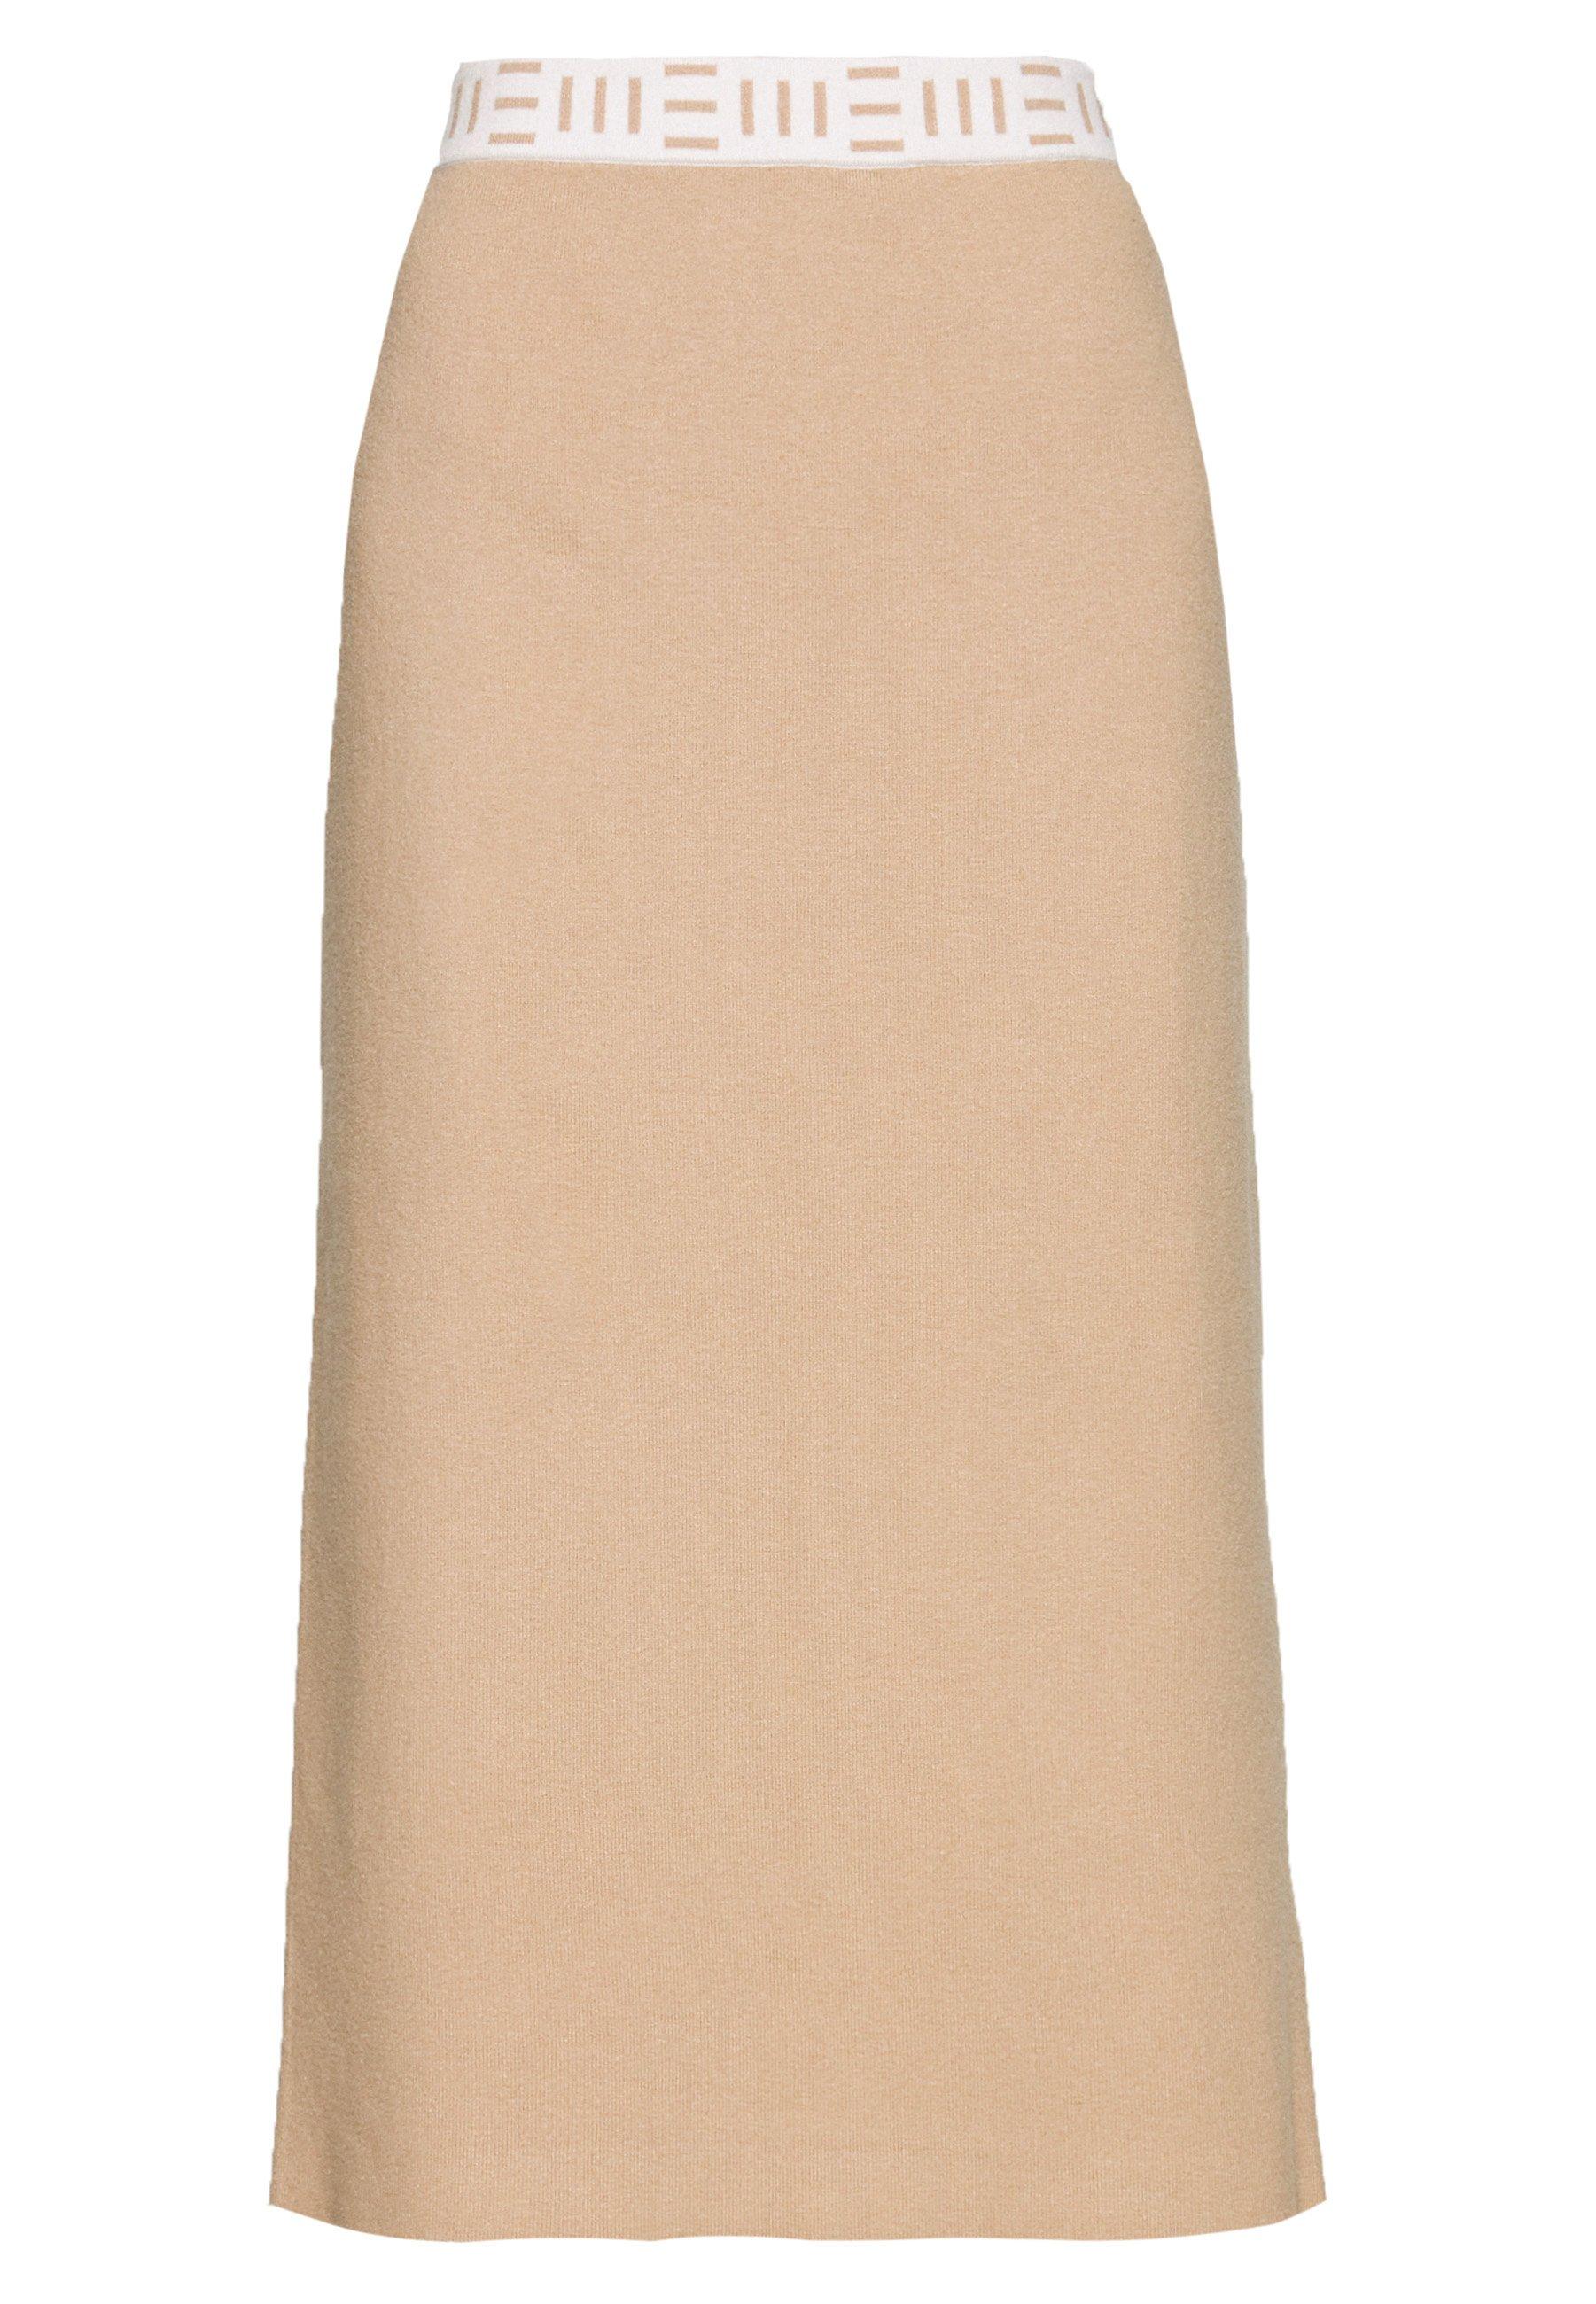 Esprit Collection PENCIL - Spódnica ołówkowa - light beige